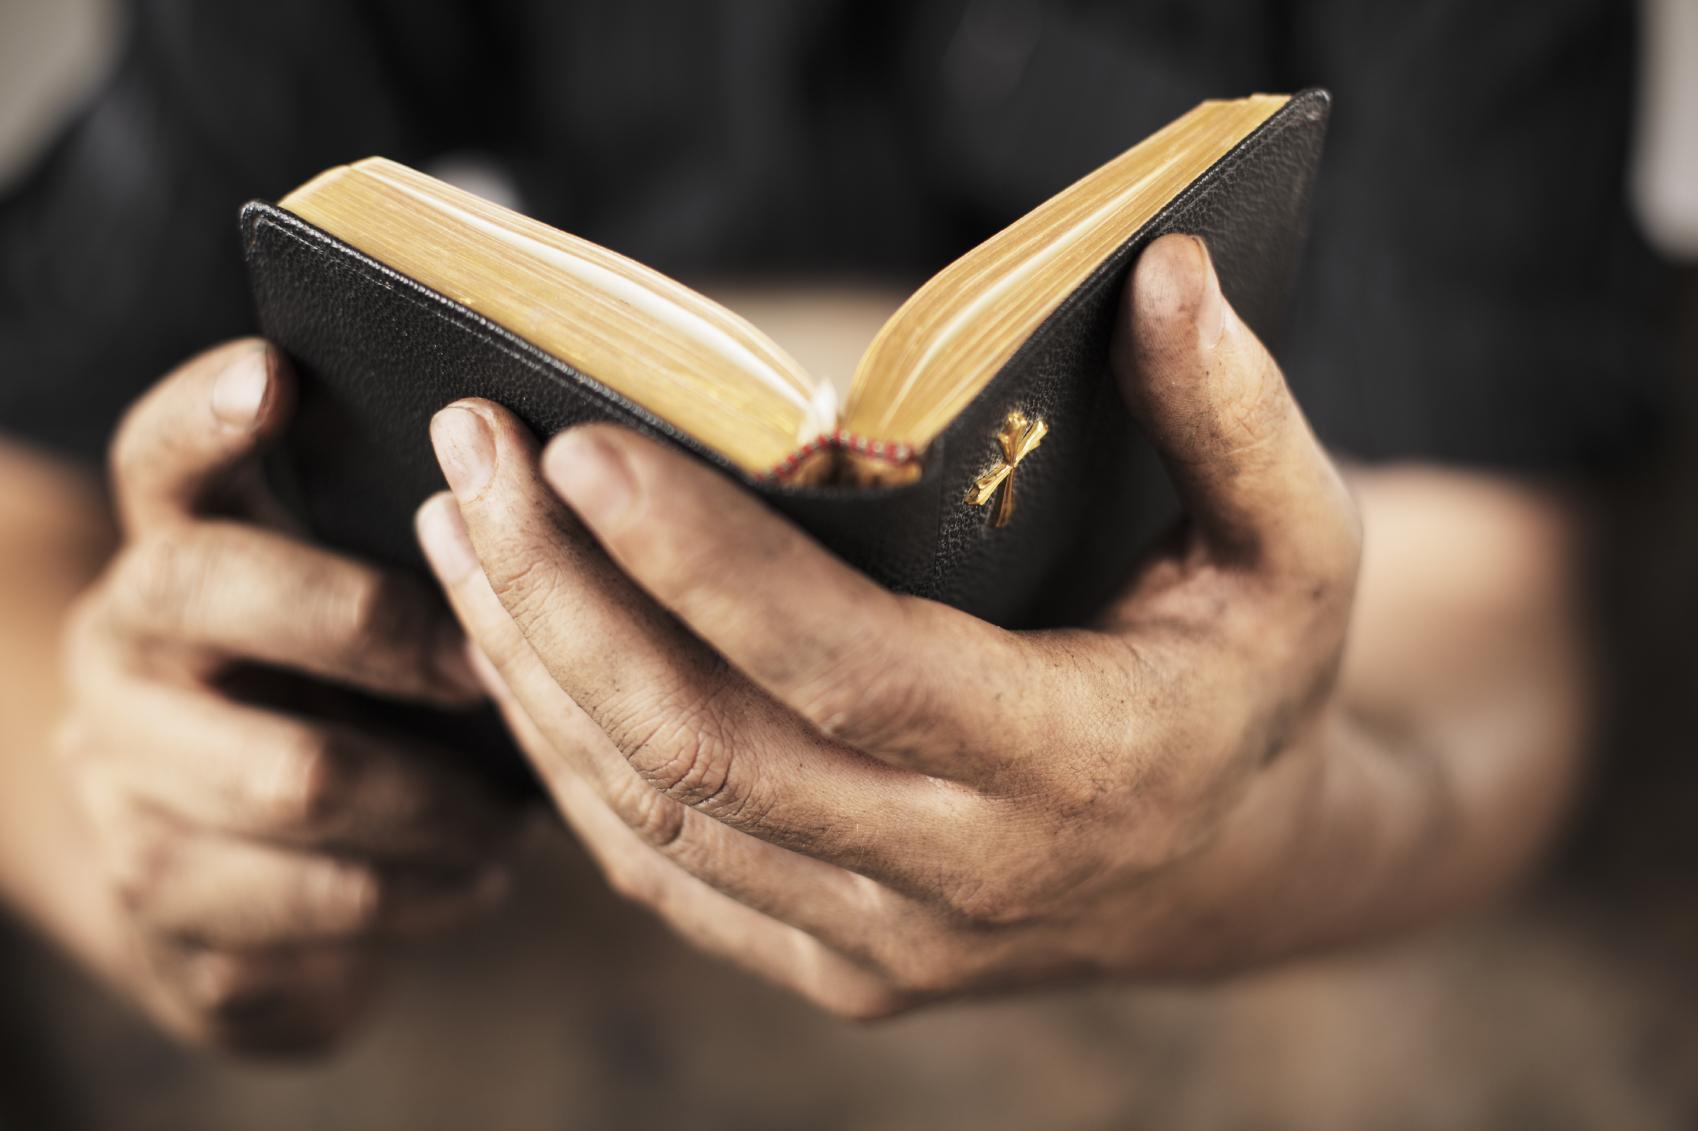 Hands holding open Bible